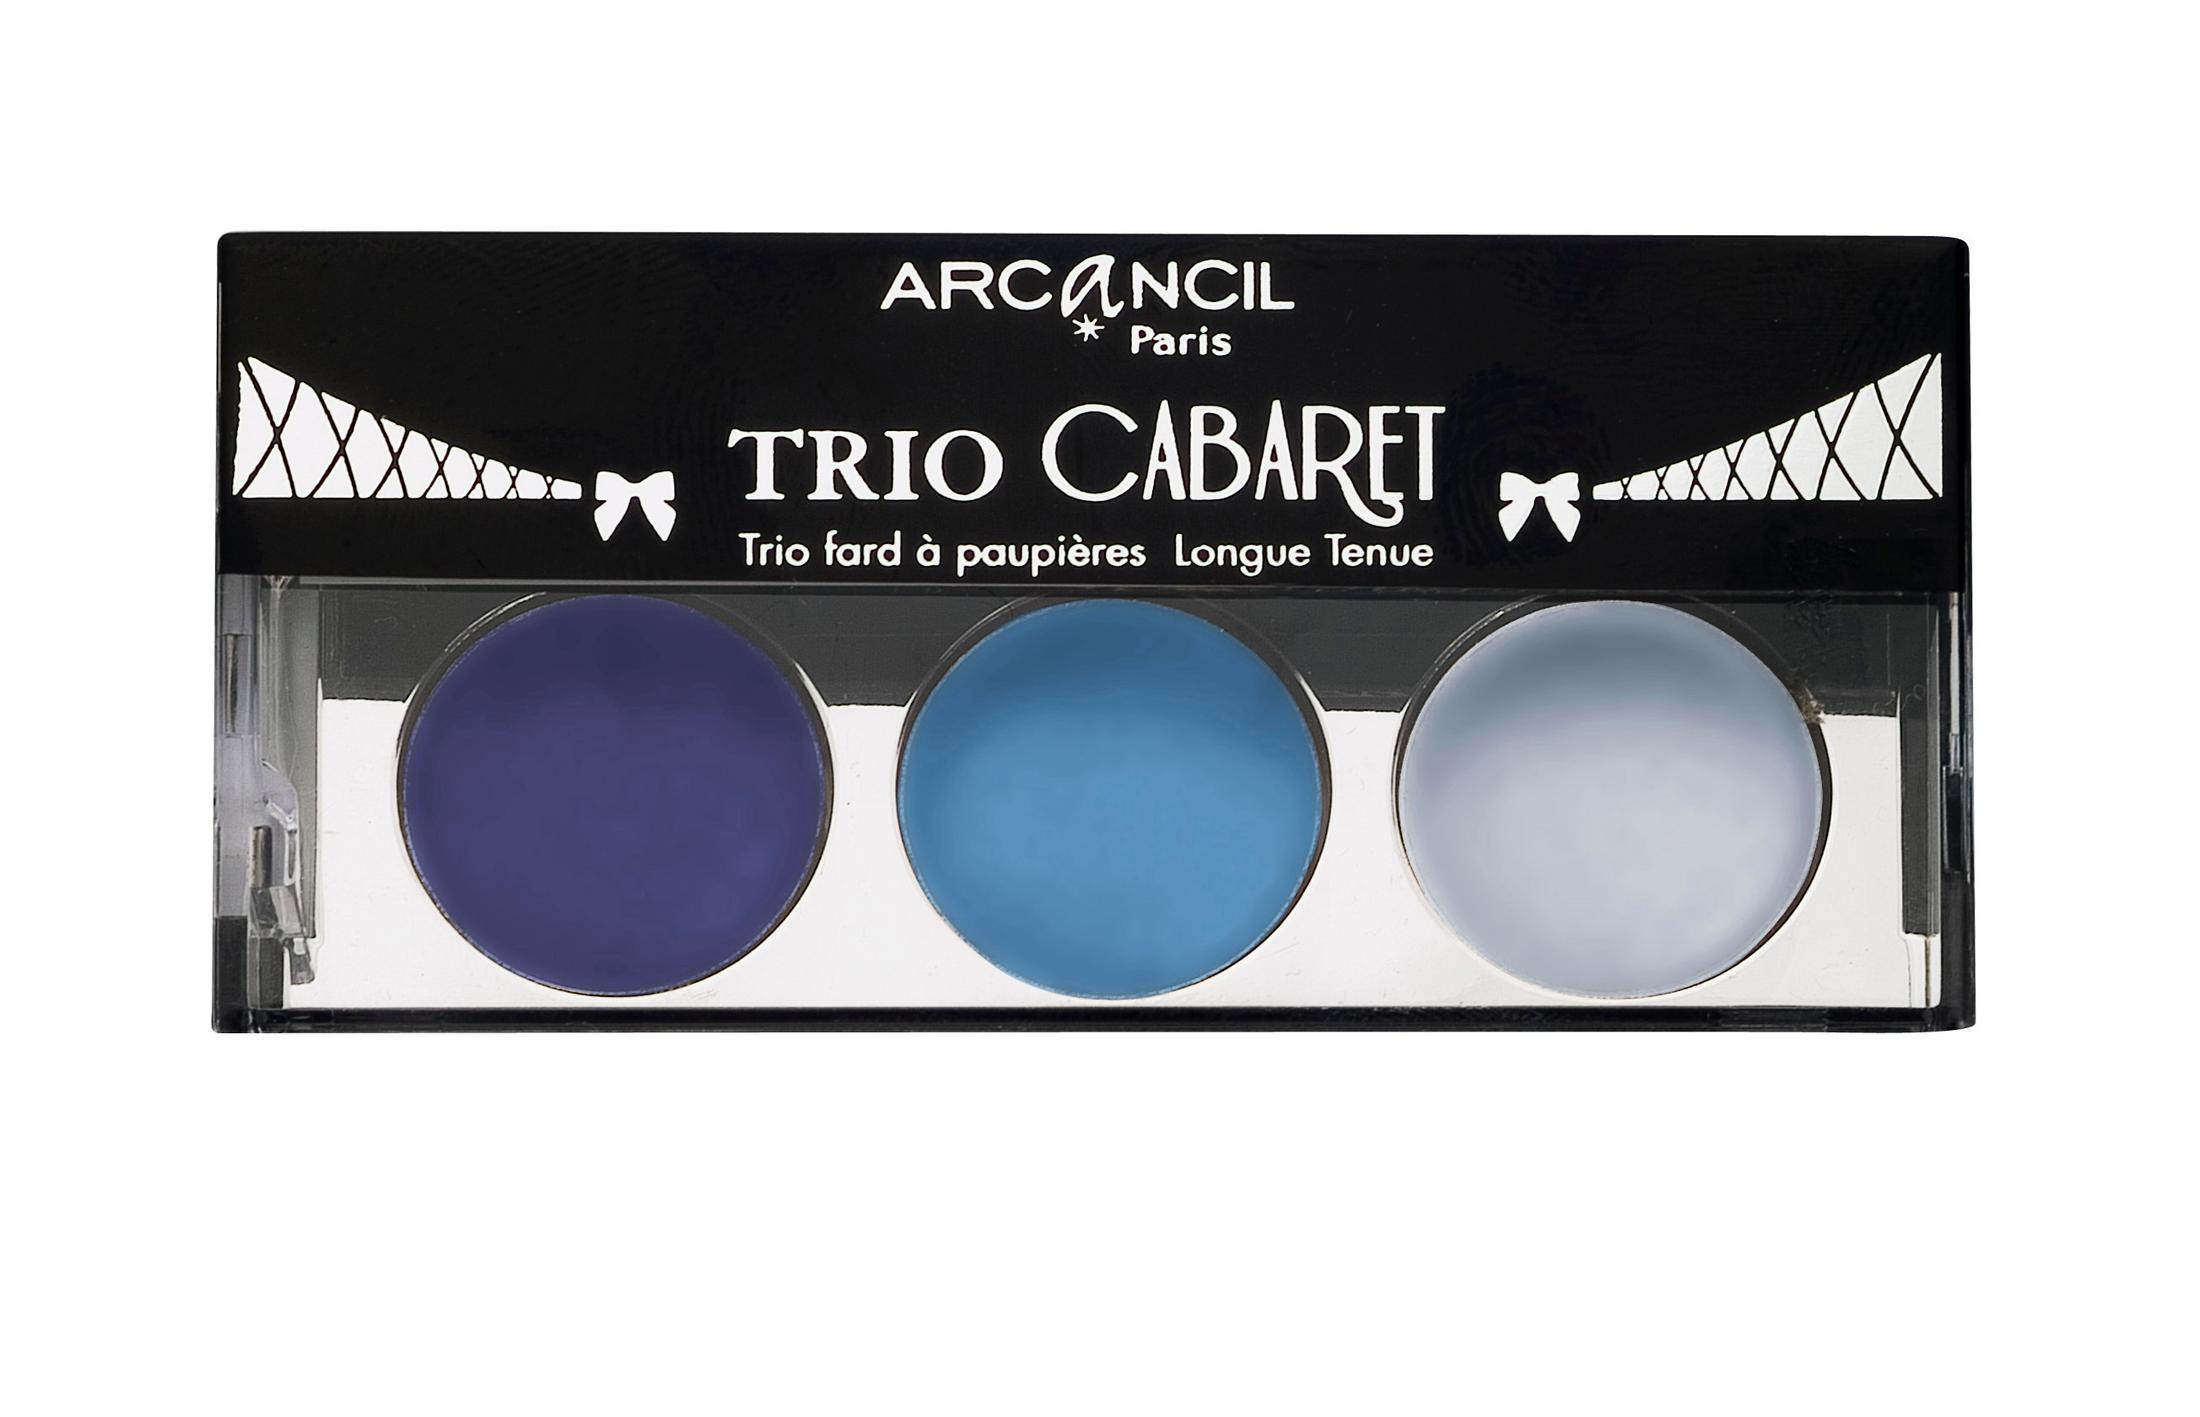 Arcancil Trio Cabaret Bleu Gauloise No.04